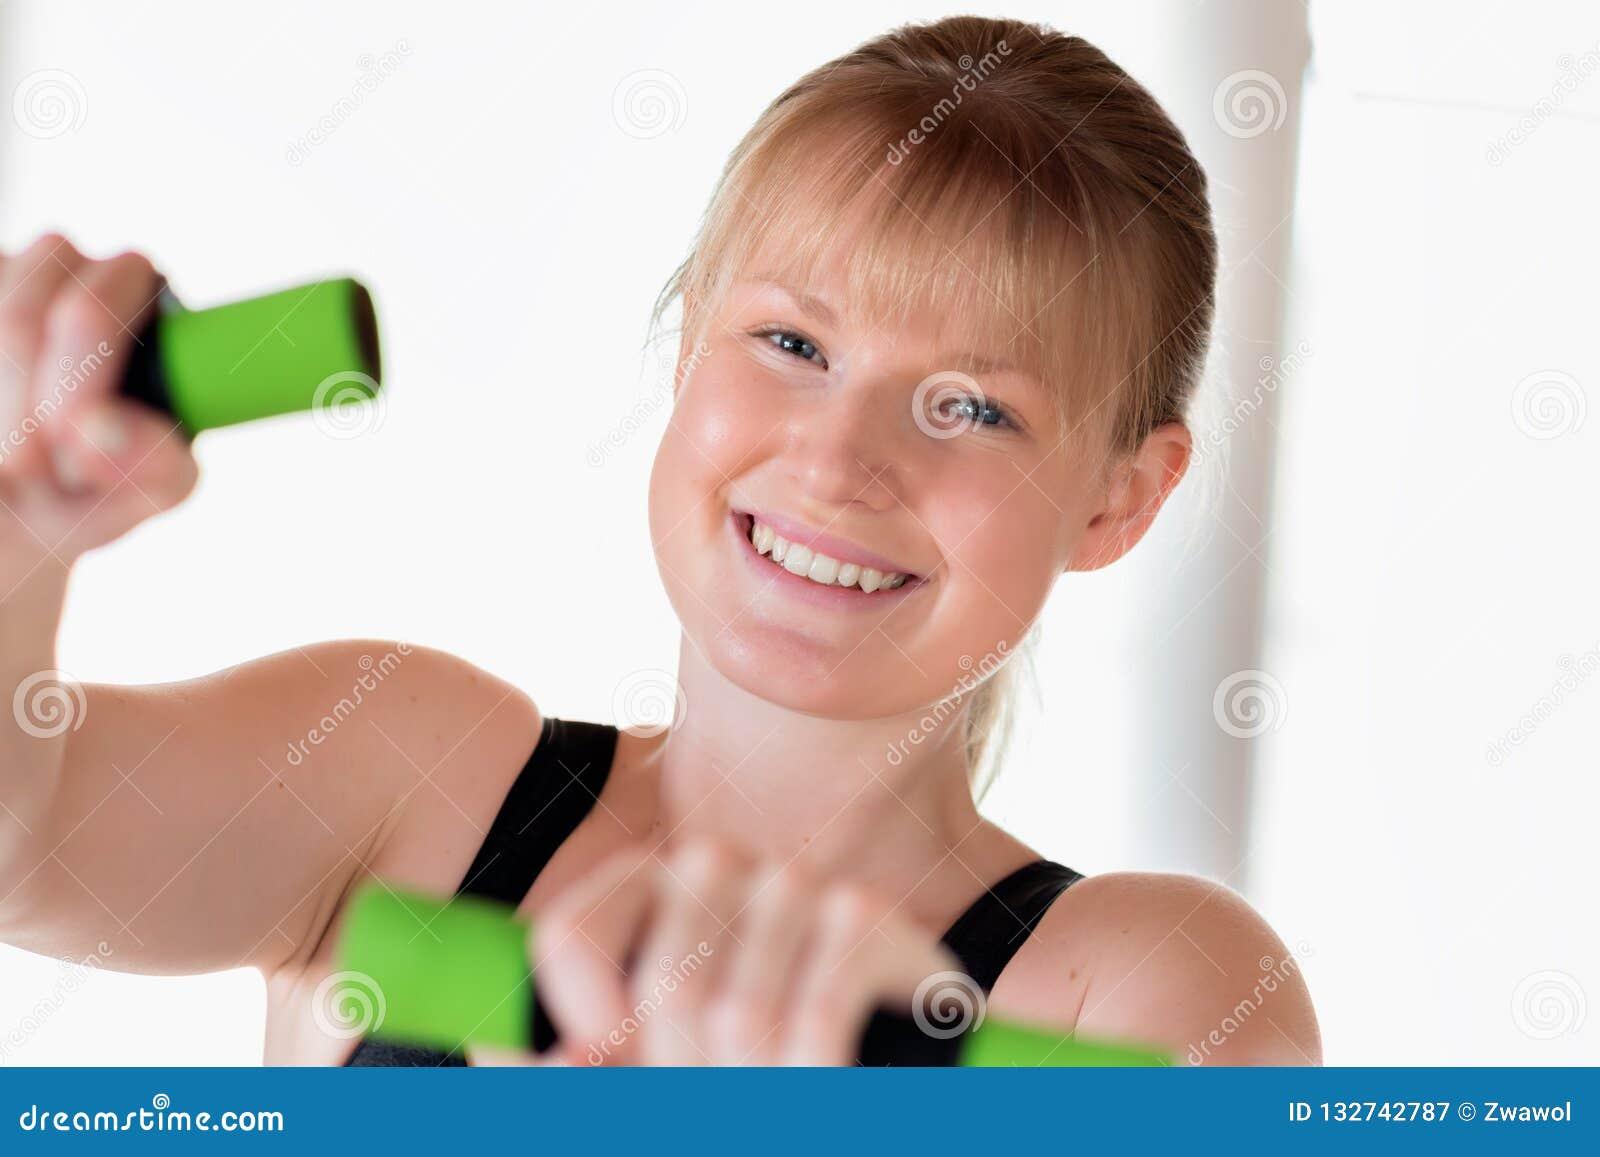 Girl Doing Dumbbell Exercises Stock Image - Image of